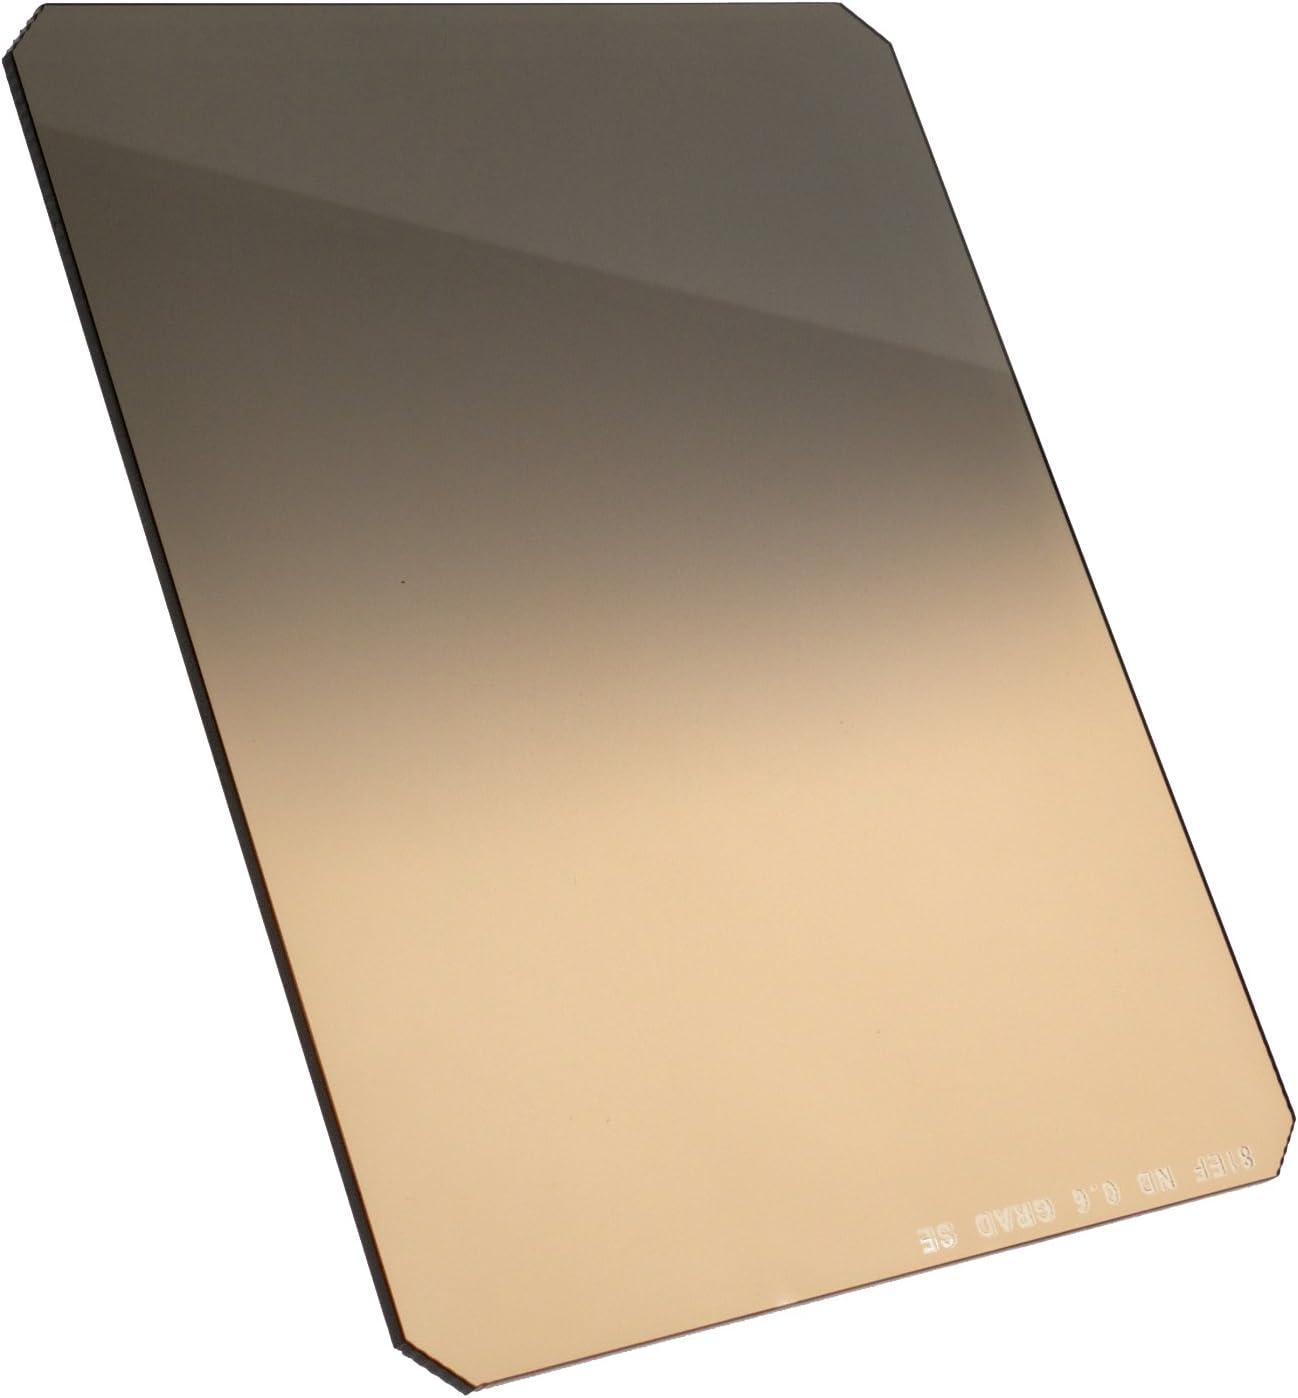 2.67x3.35 Formatt-Hitech 67x85mm Resin Color Grad Hard Edge Yellow 2